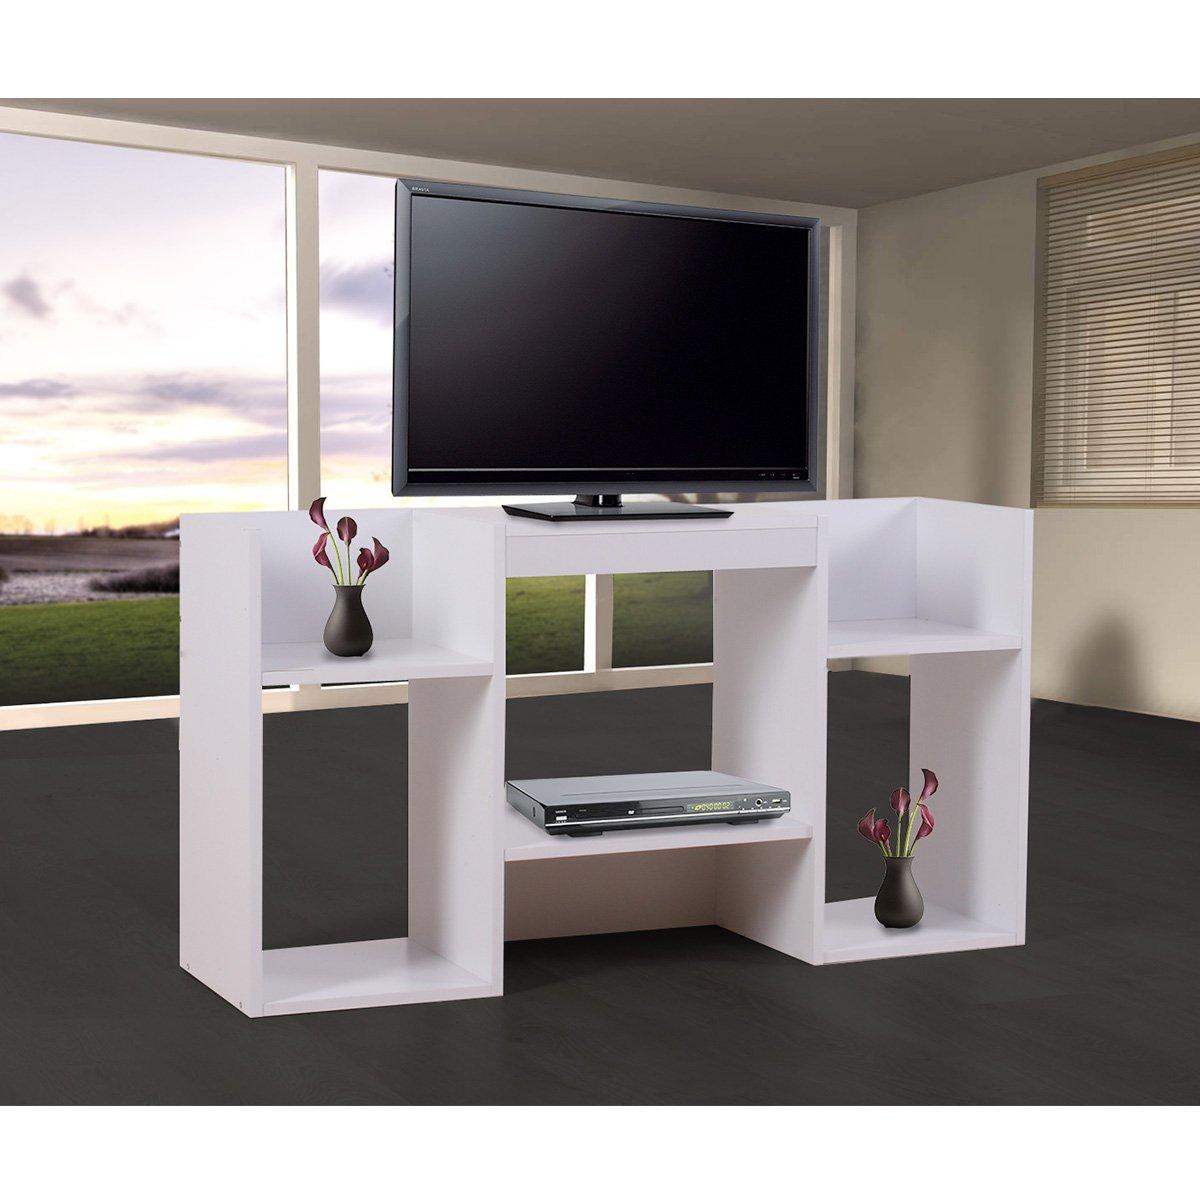 Mueble para tv soporte para tv de dise o 109x59x30 cm blanca - Soporte para television ...